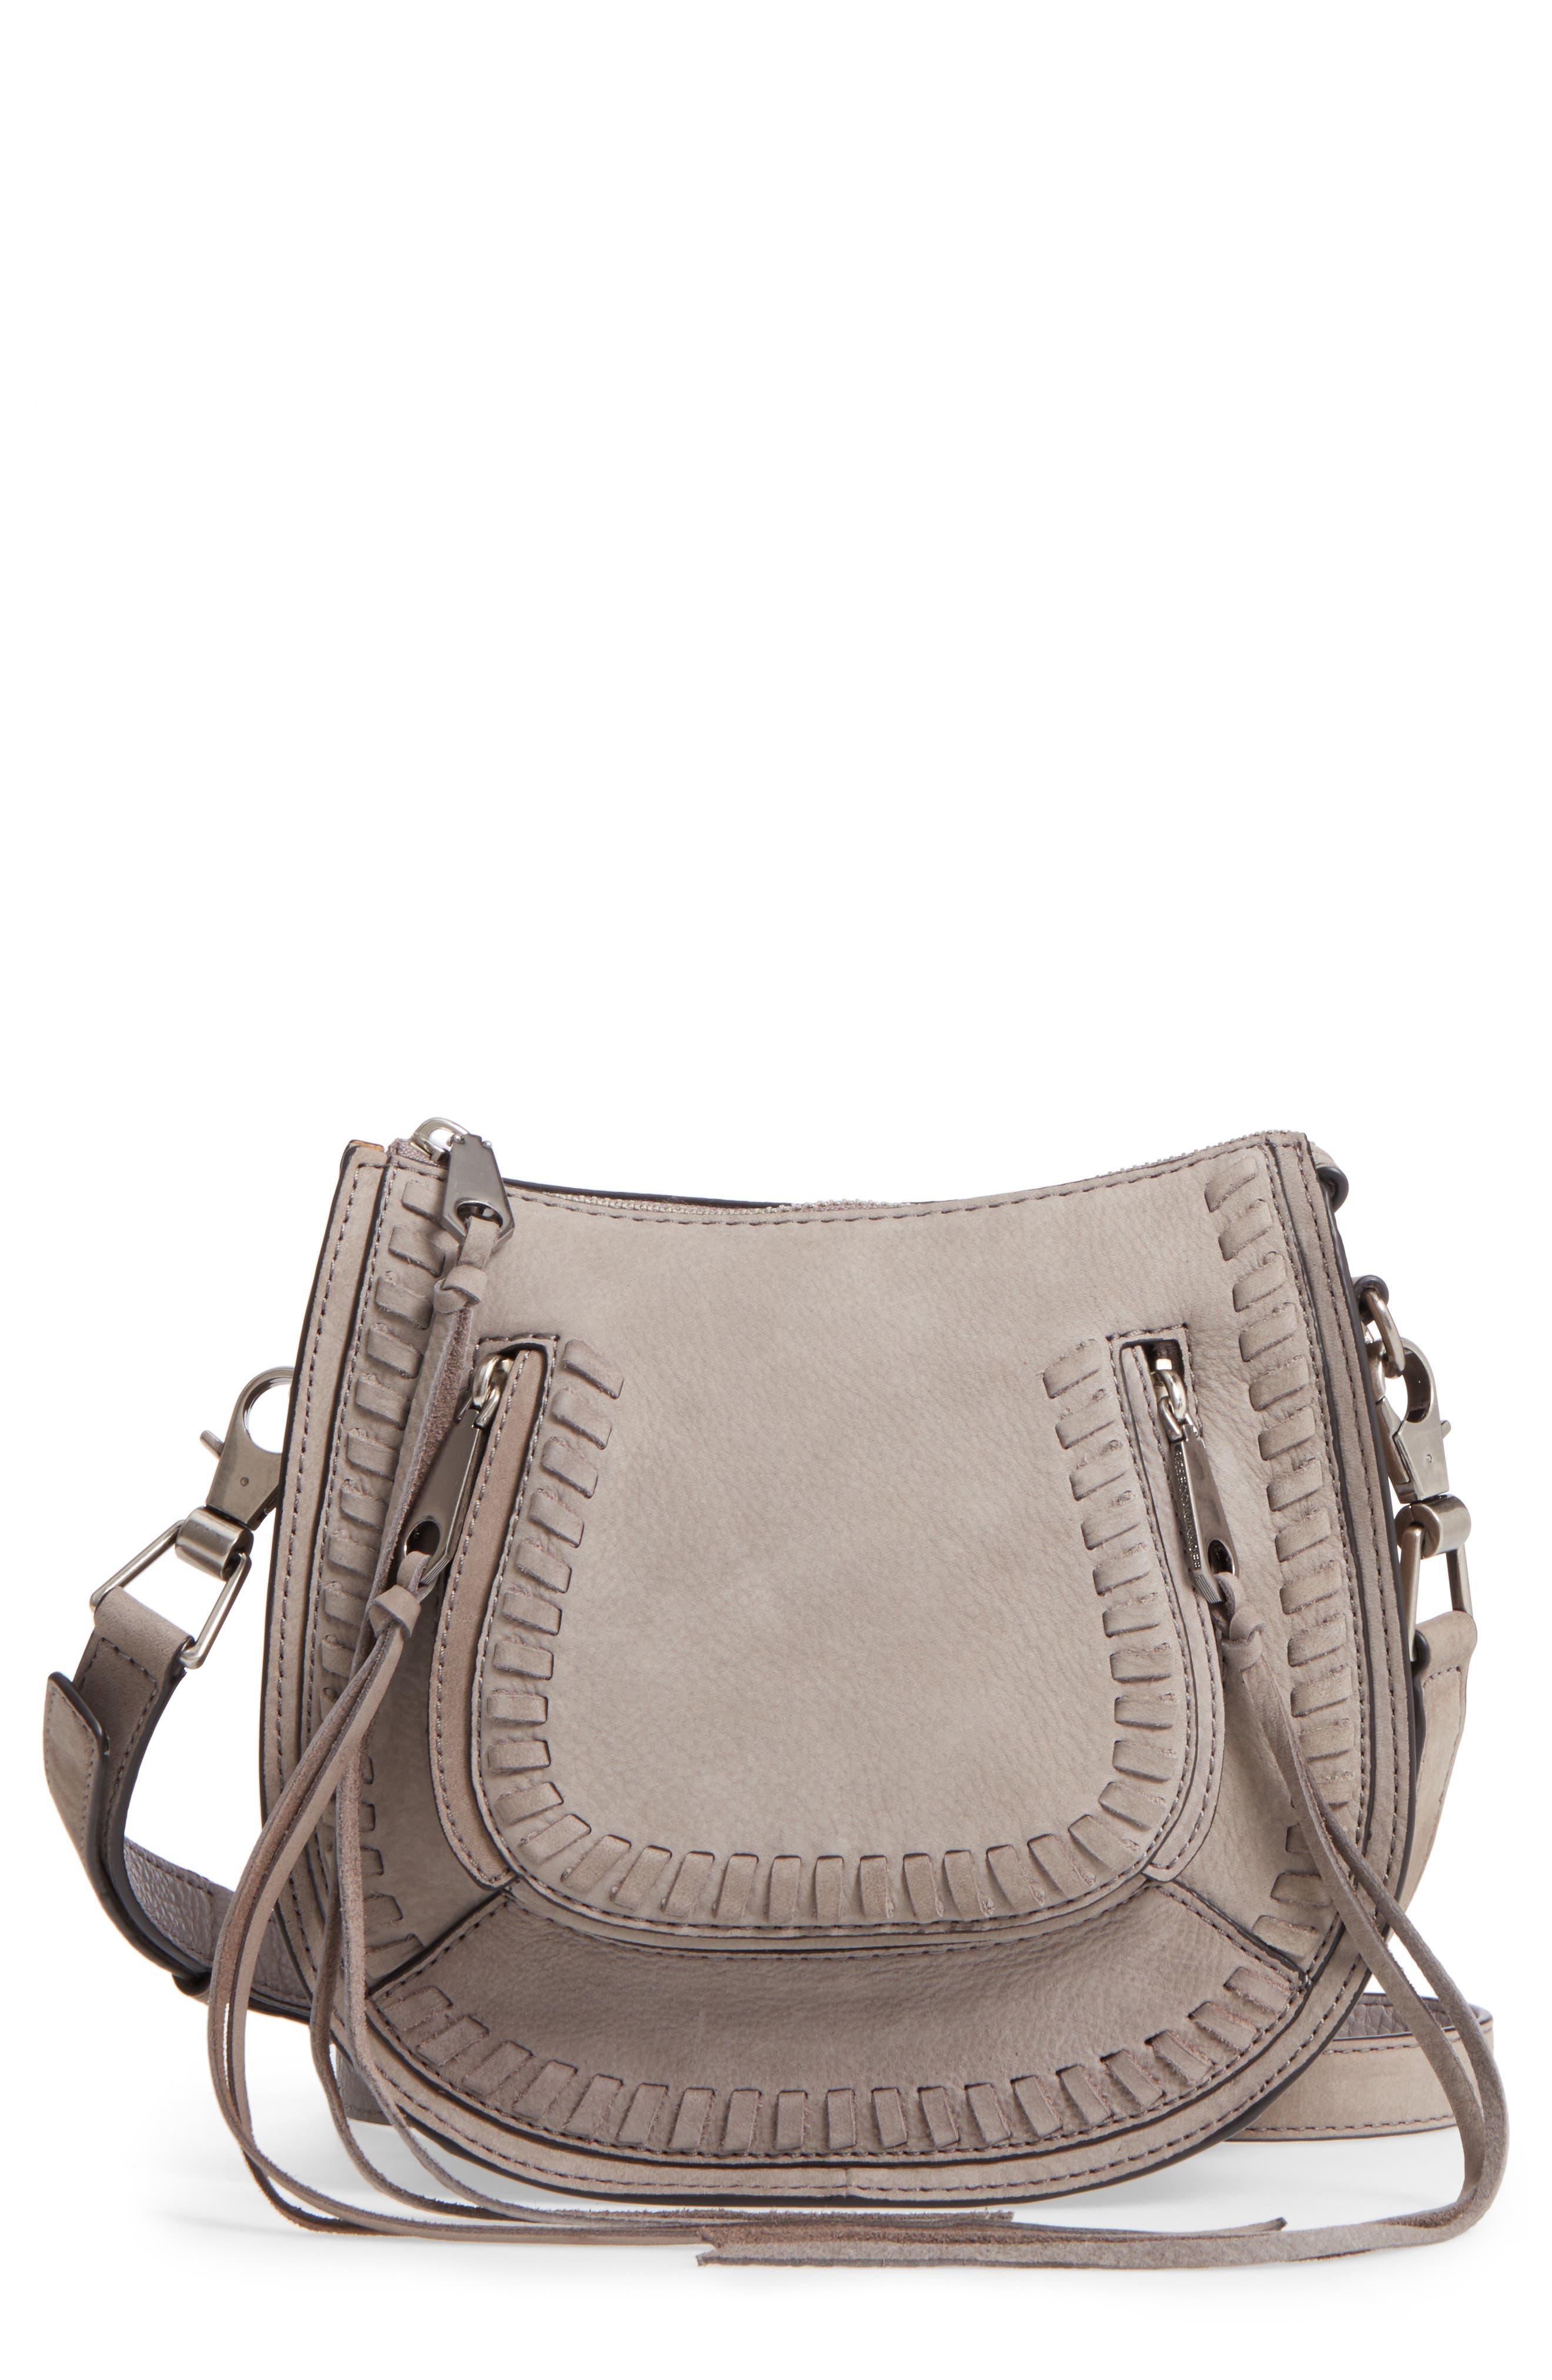 Alternate Image 1 Selected - Rebecca Minkoff Mini Vanity Saddle Bag